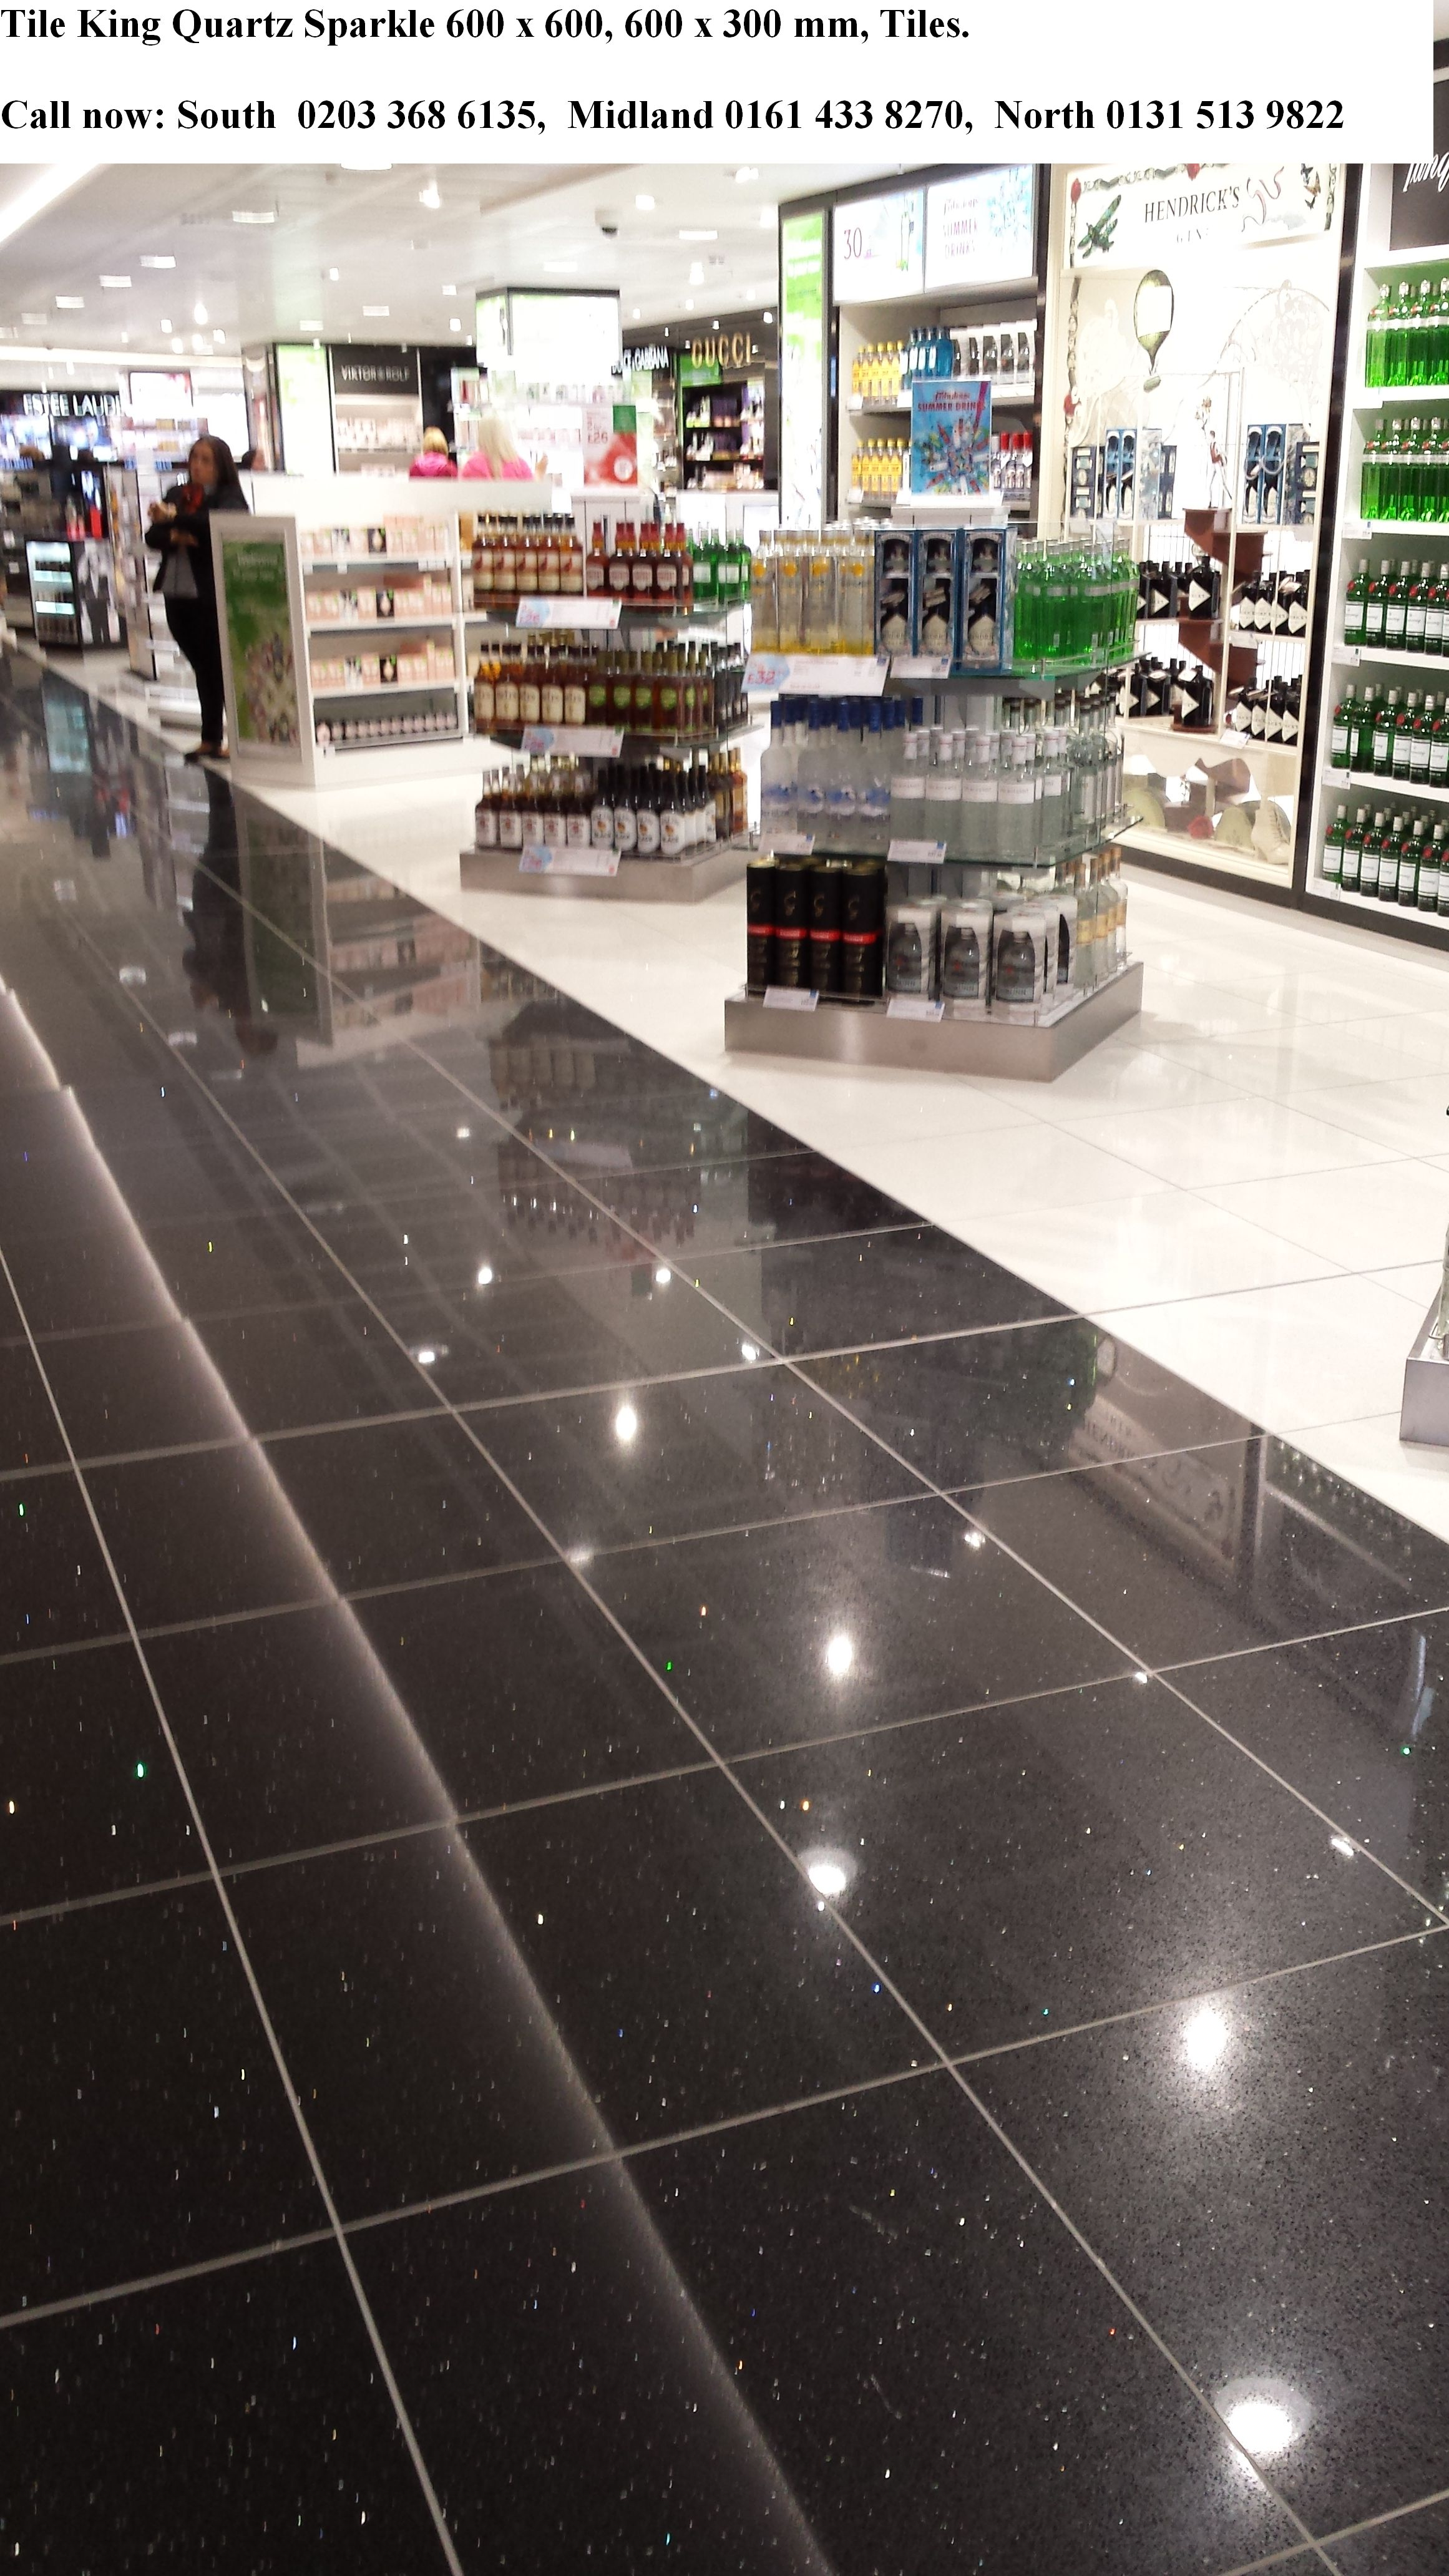 White sparkle kitchen floor tiles gotken collection of tile king be inspired quartz white sparkle kitchen floor tiles dailygadgetfo Images